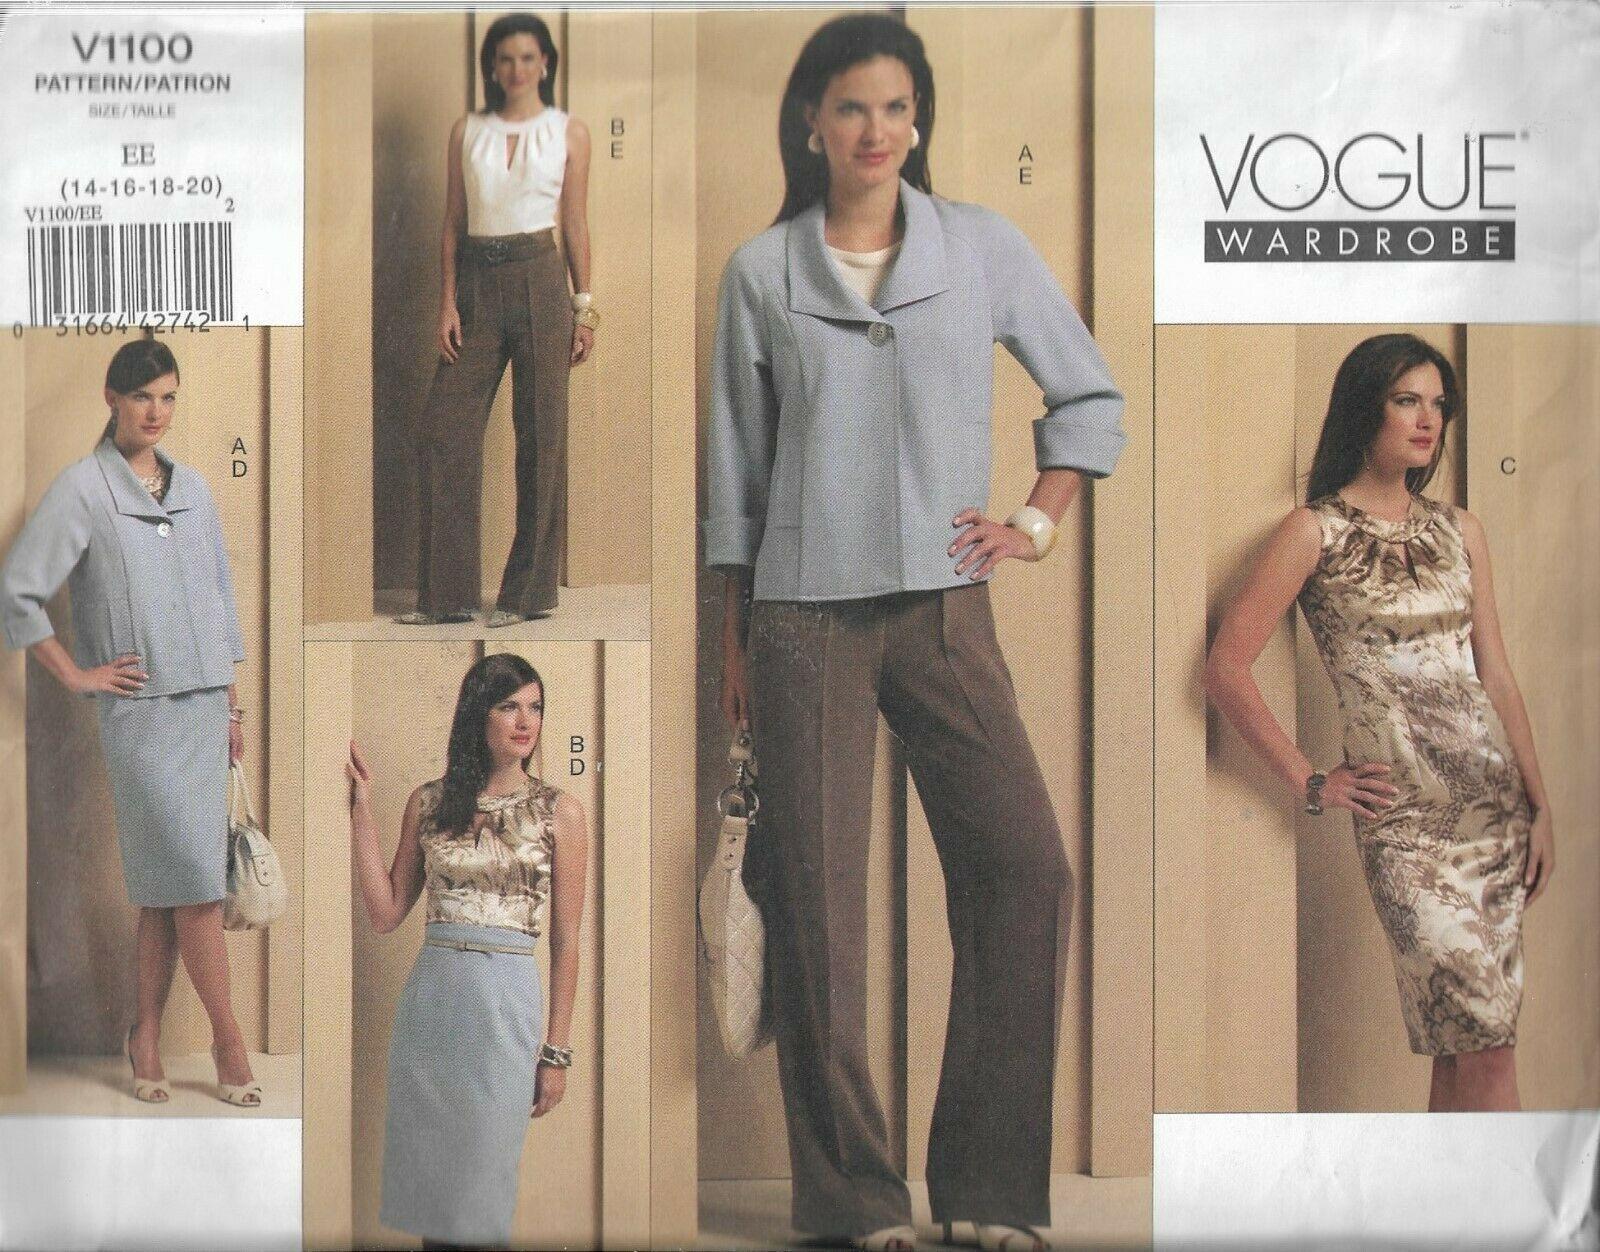 Plus Sz VOGUE Wardrobe Pattern #V1100-Misses Jacket-Top-Dress-Skirt-Pants 14-20